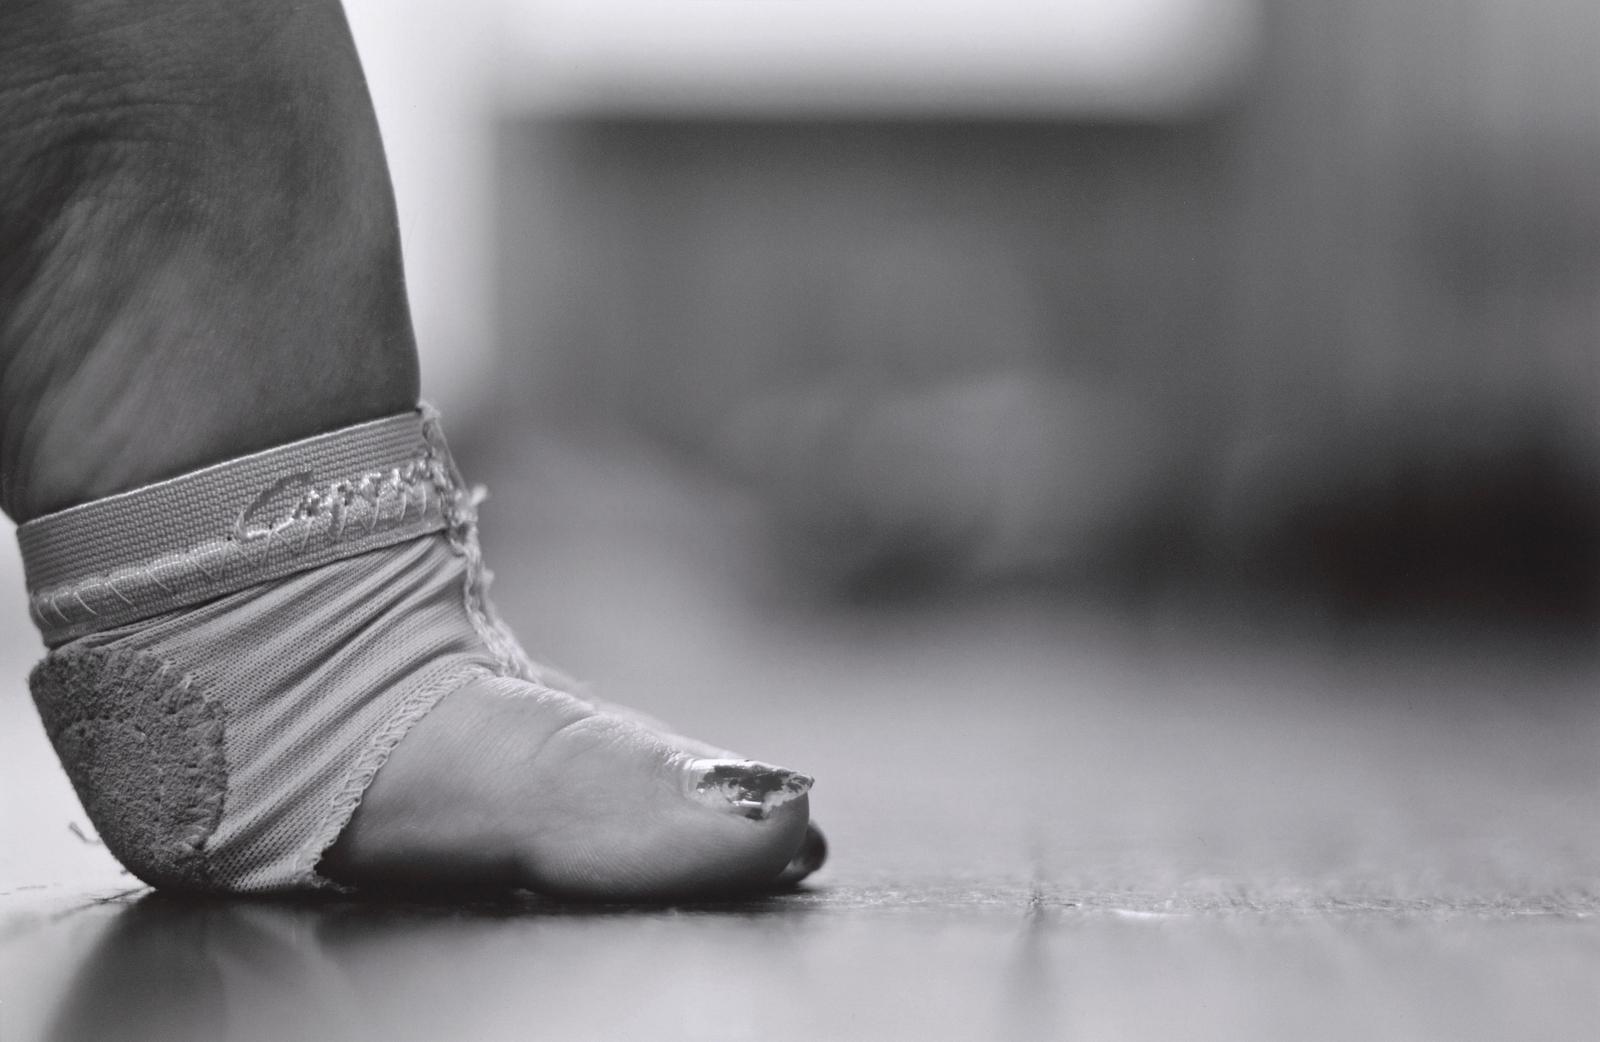 Ball, heel & toe image